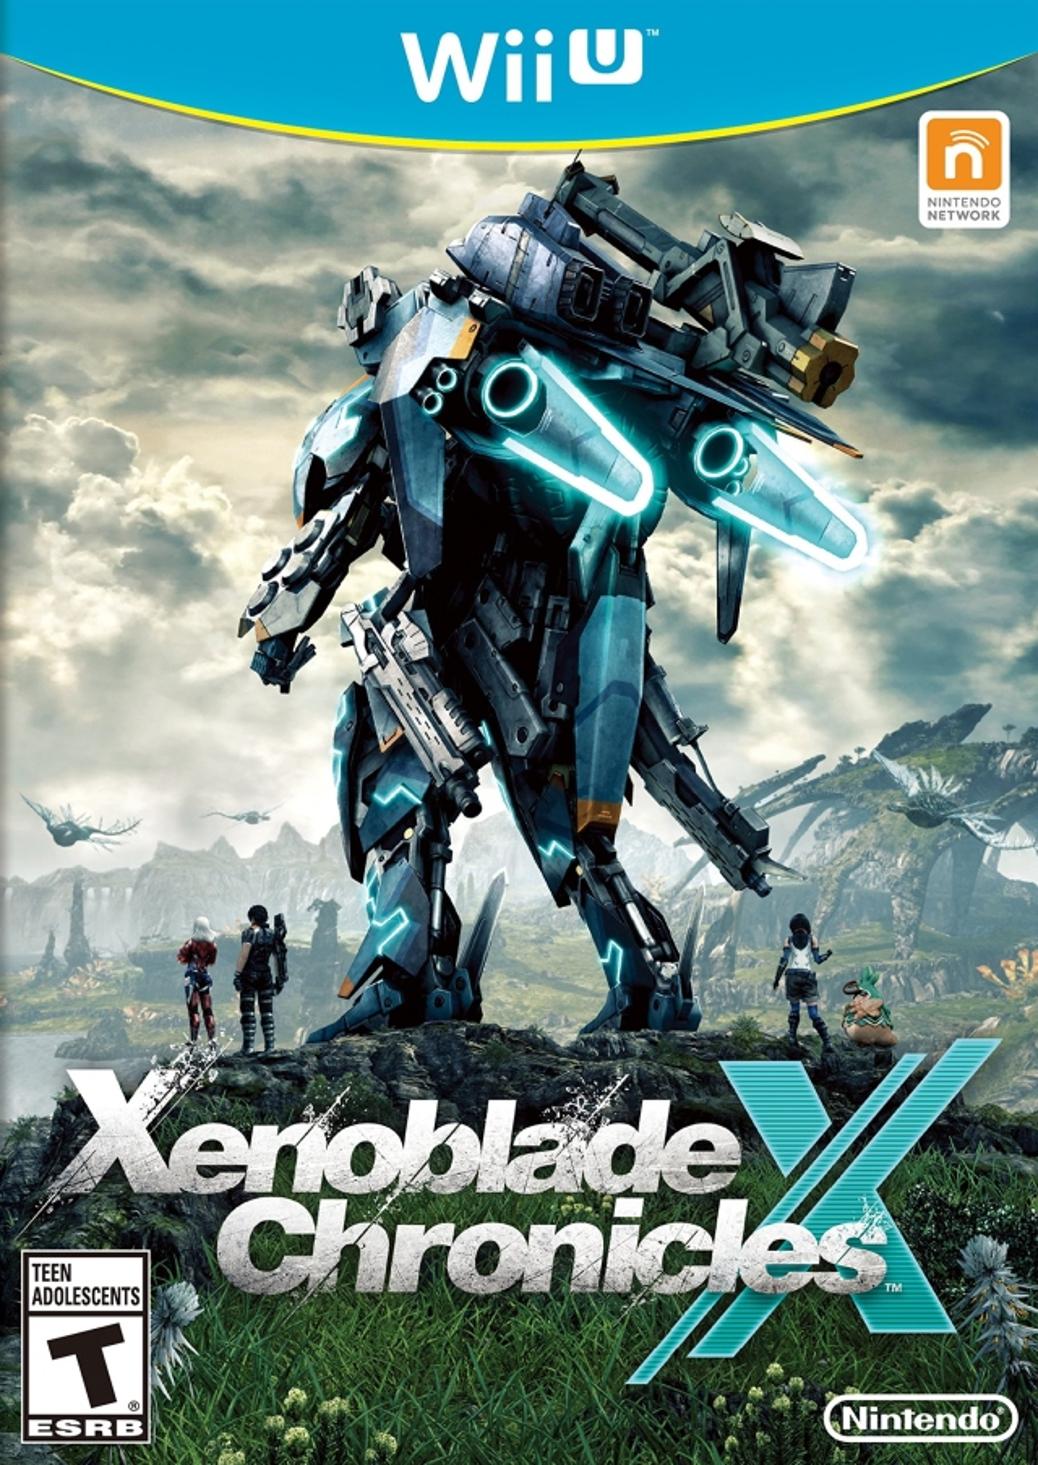 Xenoblade Chronicles X - Wii X - North American Box Art